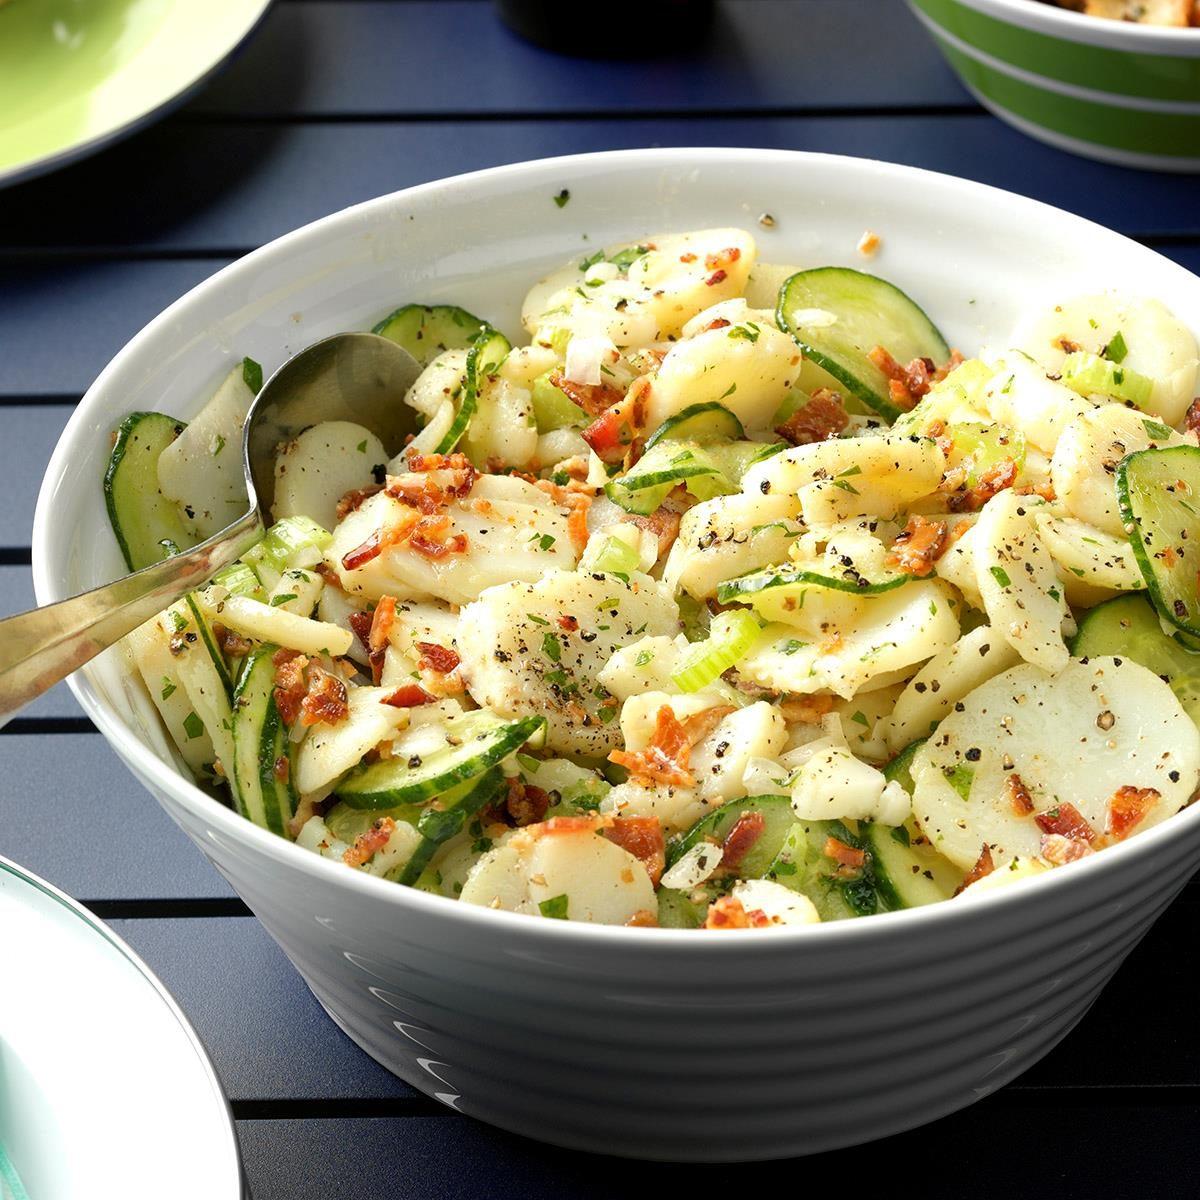 Mama S Warm German Potato Salad Exps Thjj17 164559 D02 03 4b 4